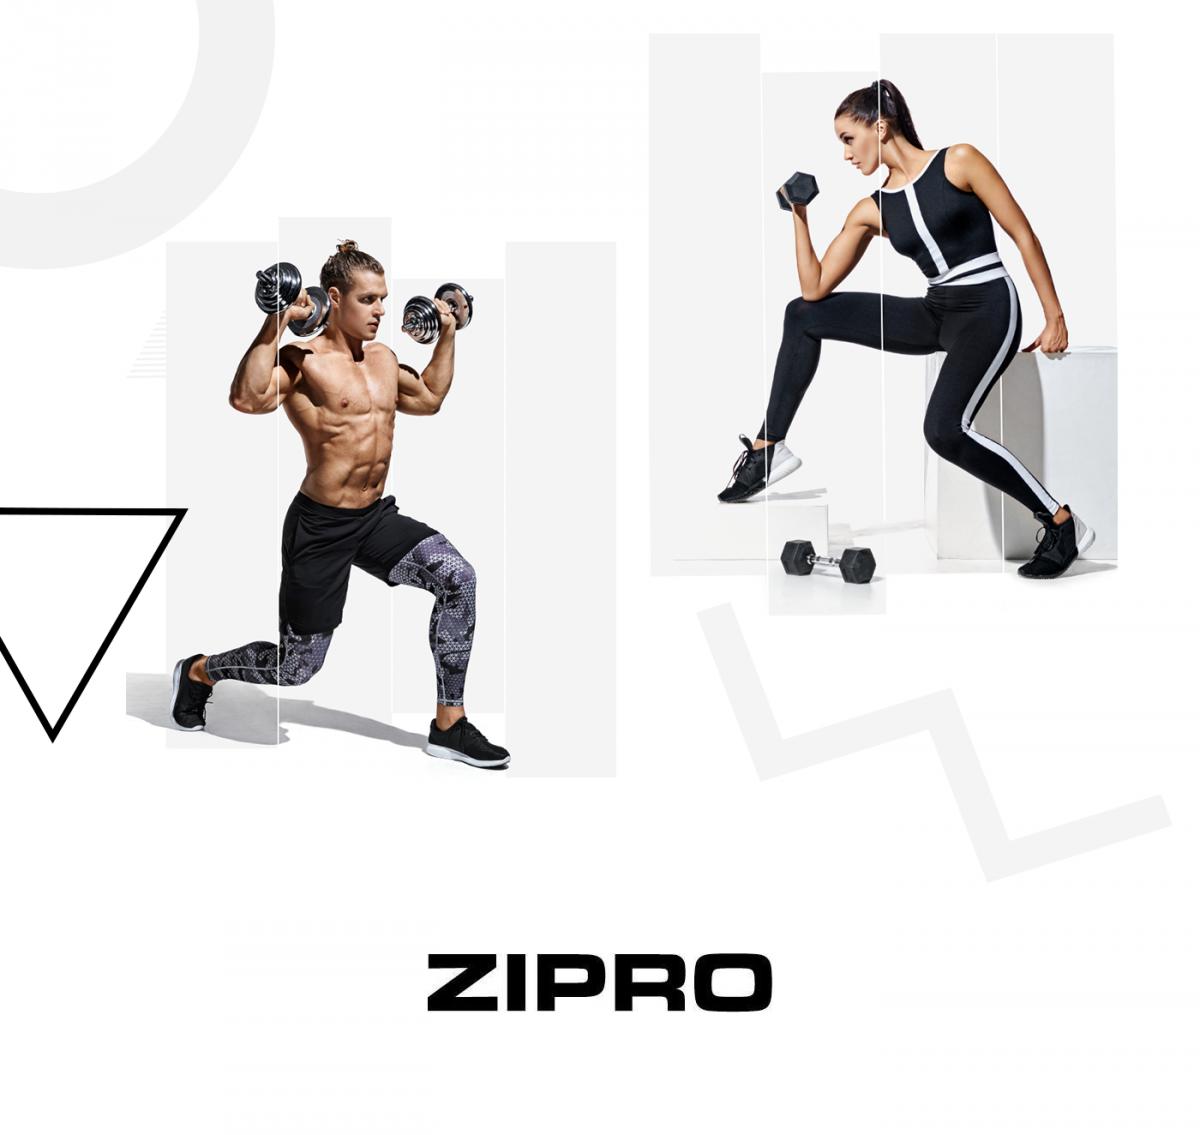 veneo_cs_zipro_2020_14